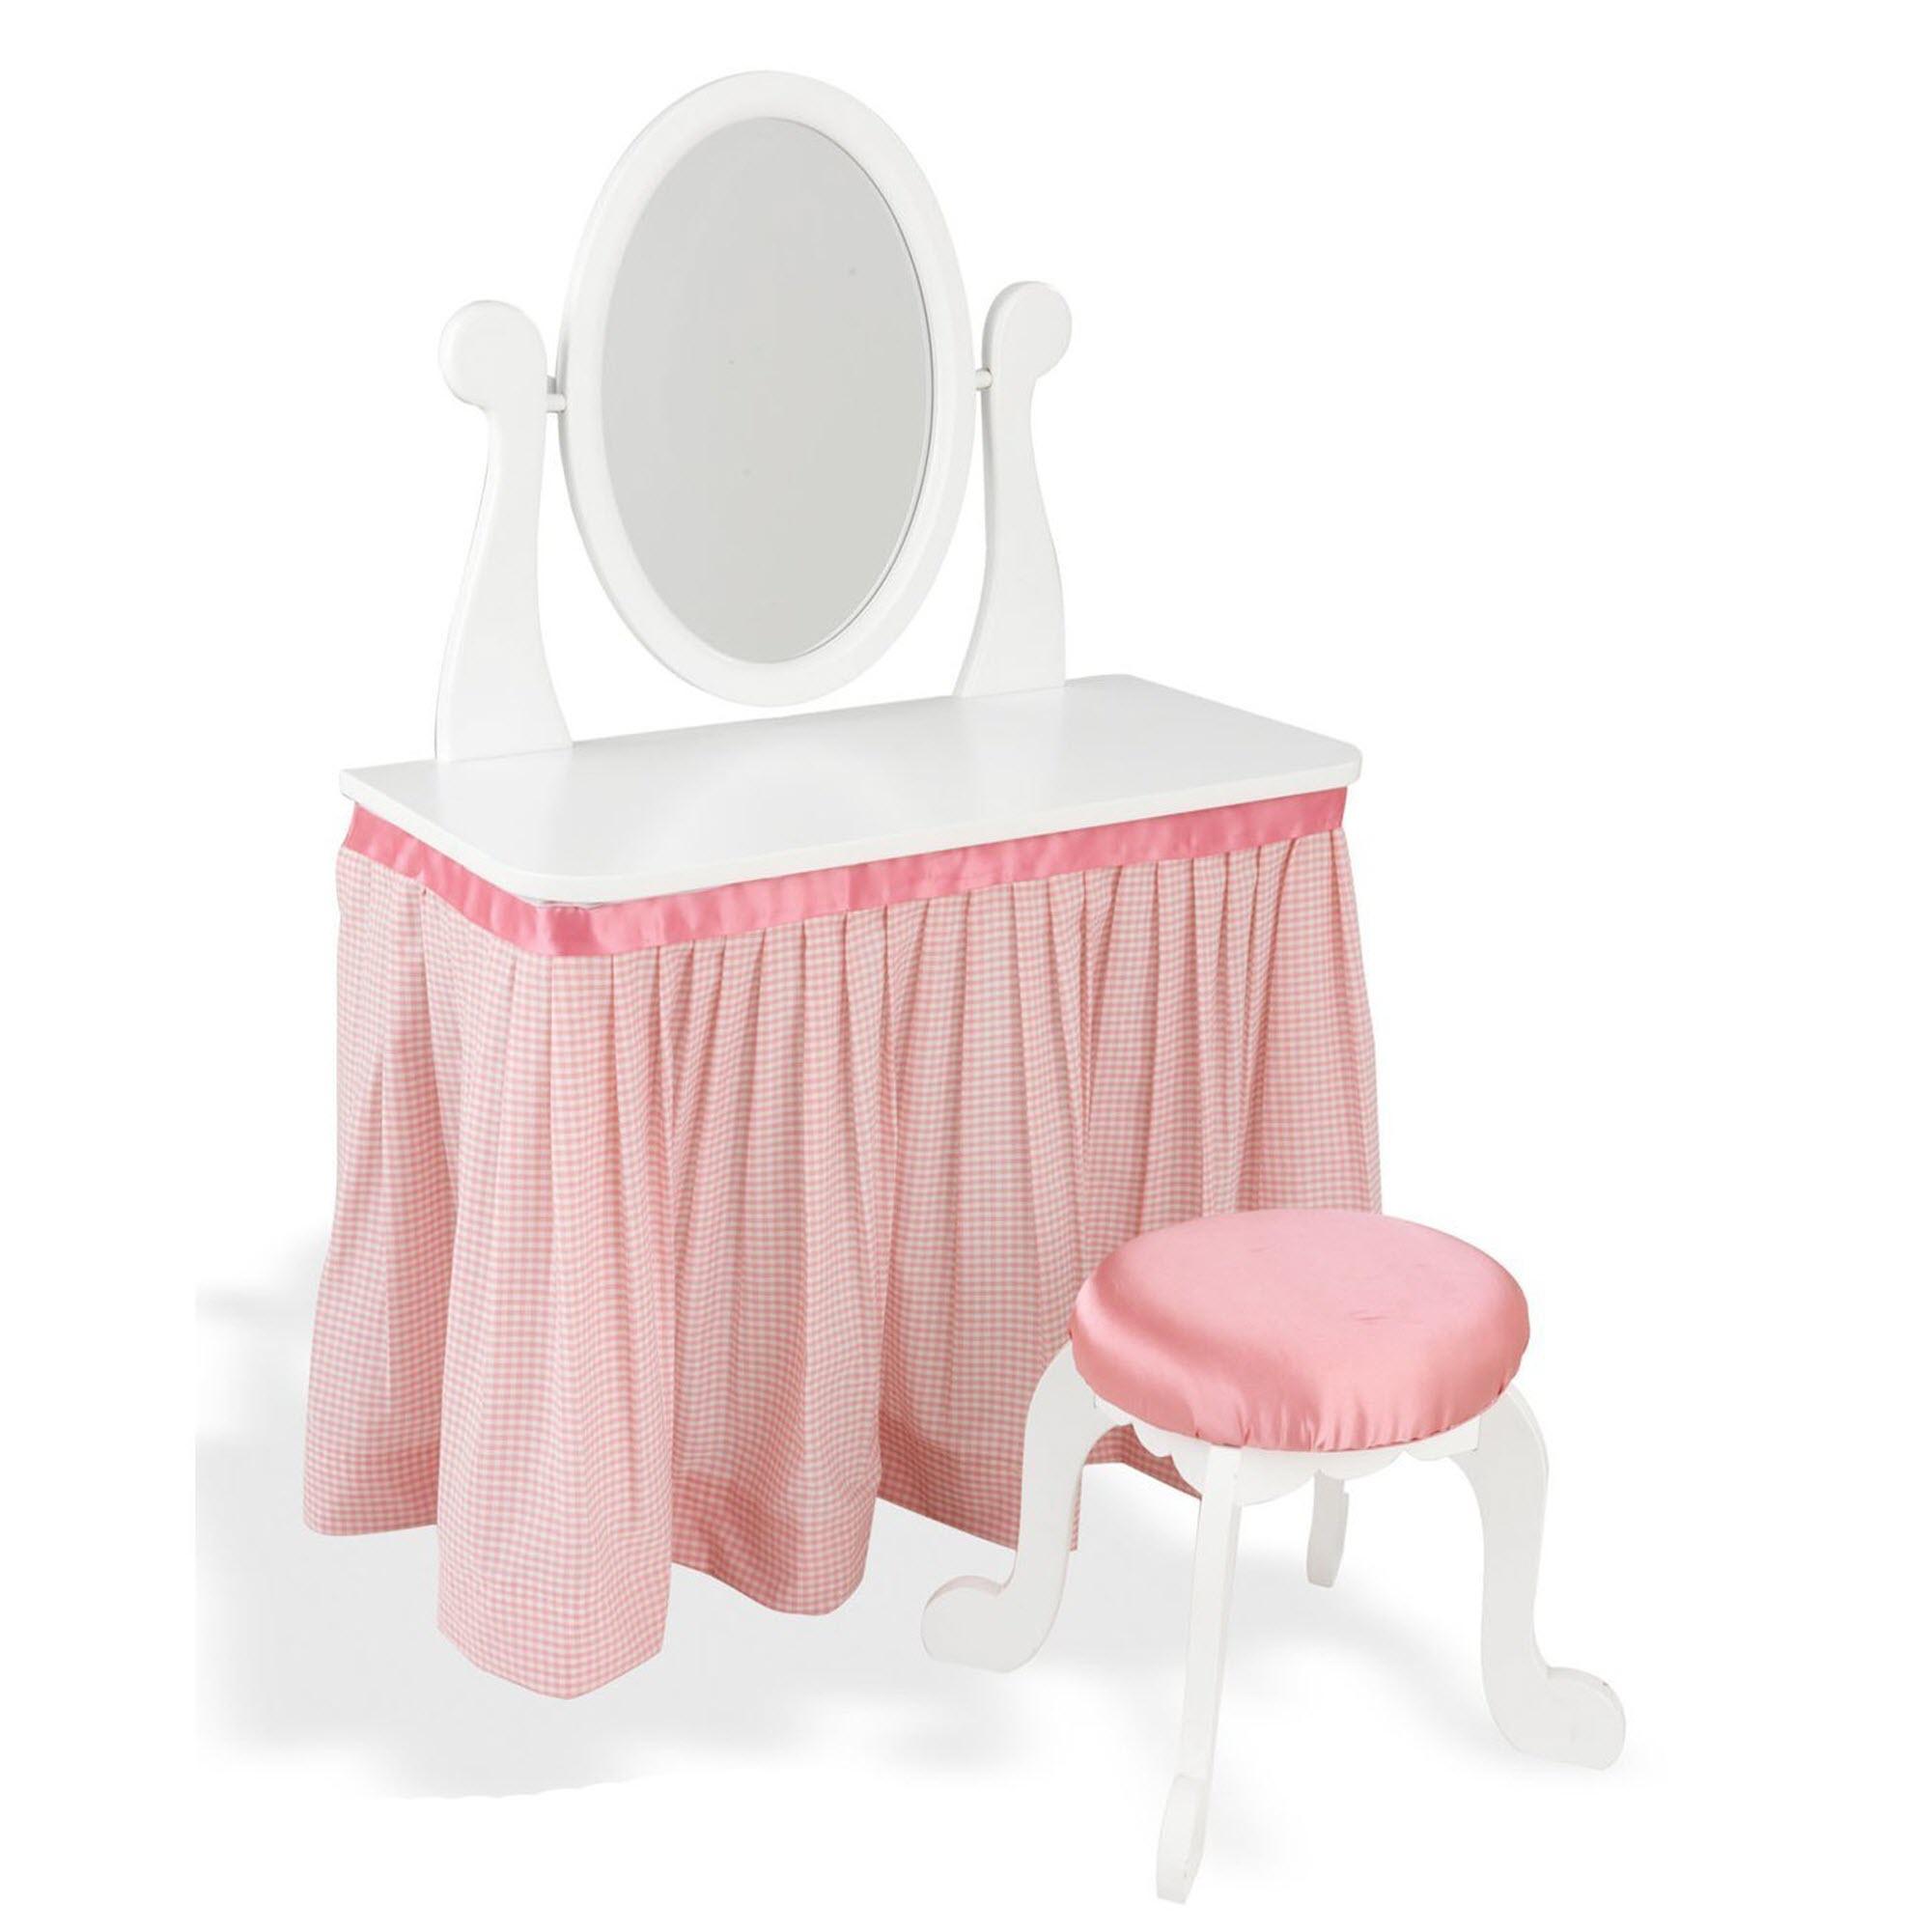 Vanity table for kids - 2